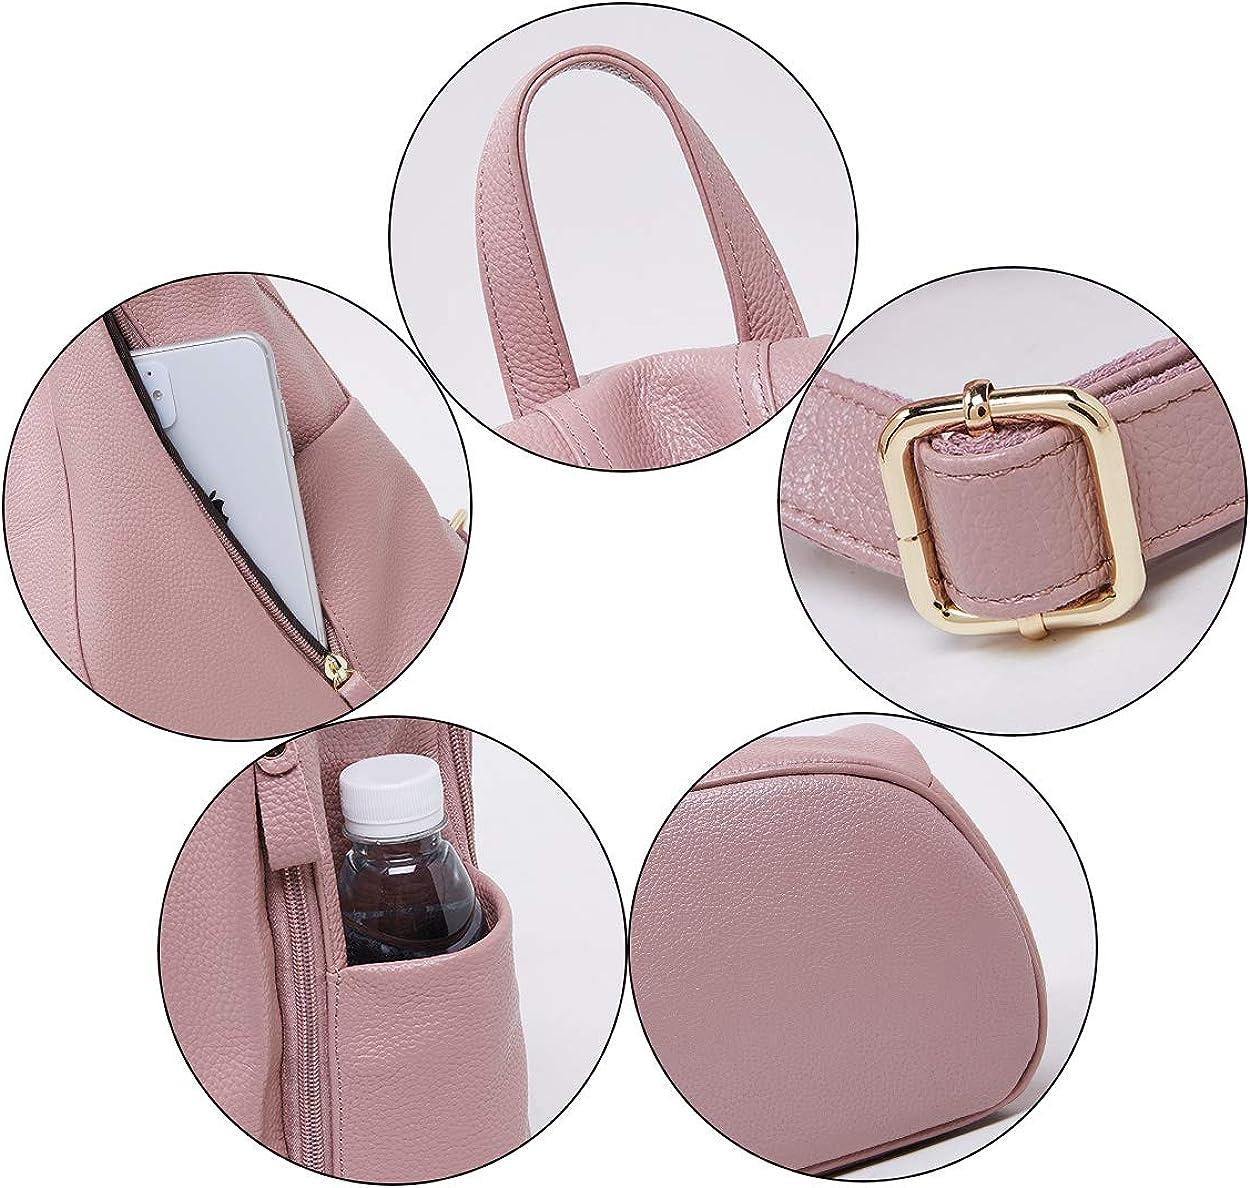 BOYATU Genuine Leather Backpack for Women Anti-theft Rucksack Ladies Travel Bag Back Open